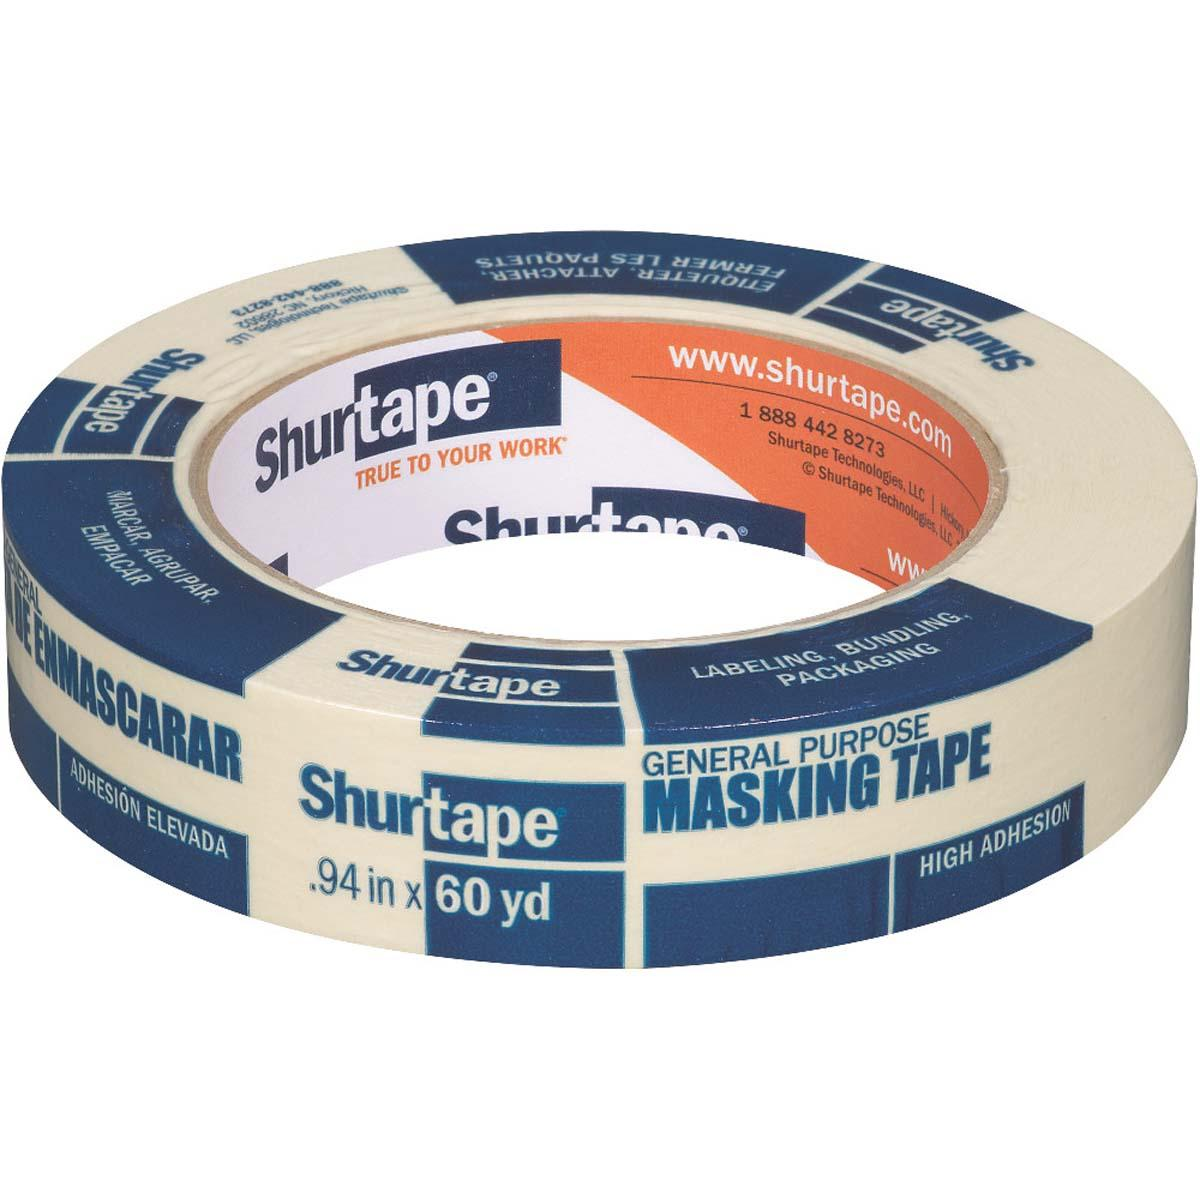 CP 105 General Purpose Grade, Medium-High Adhesion Masking Tape - NATURAL - 24MM x 55M